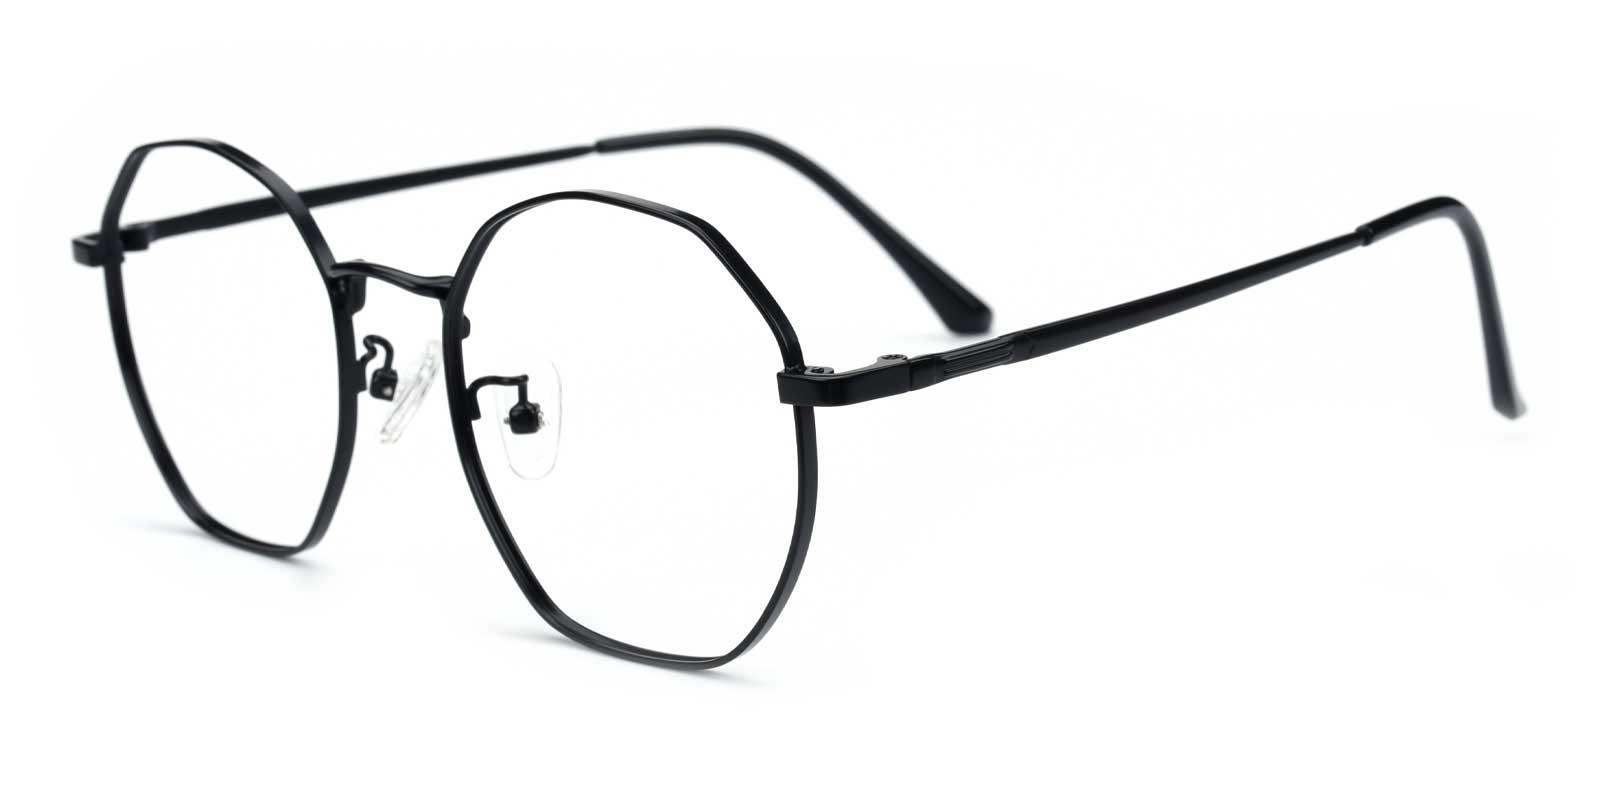 Loren-Black-Geometric-Metal-Eyeglasses-additional1